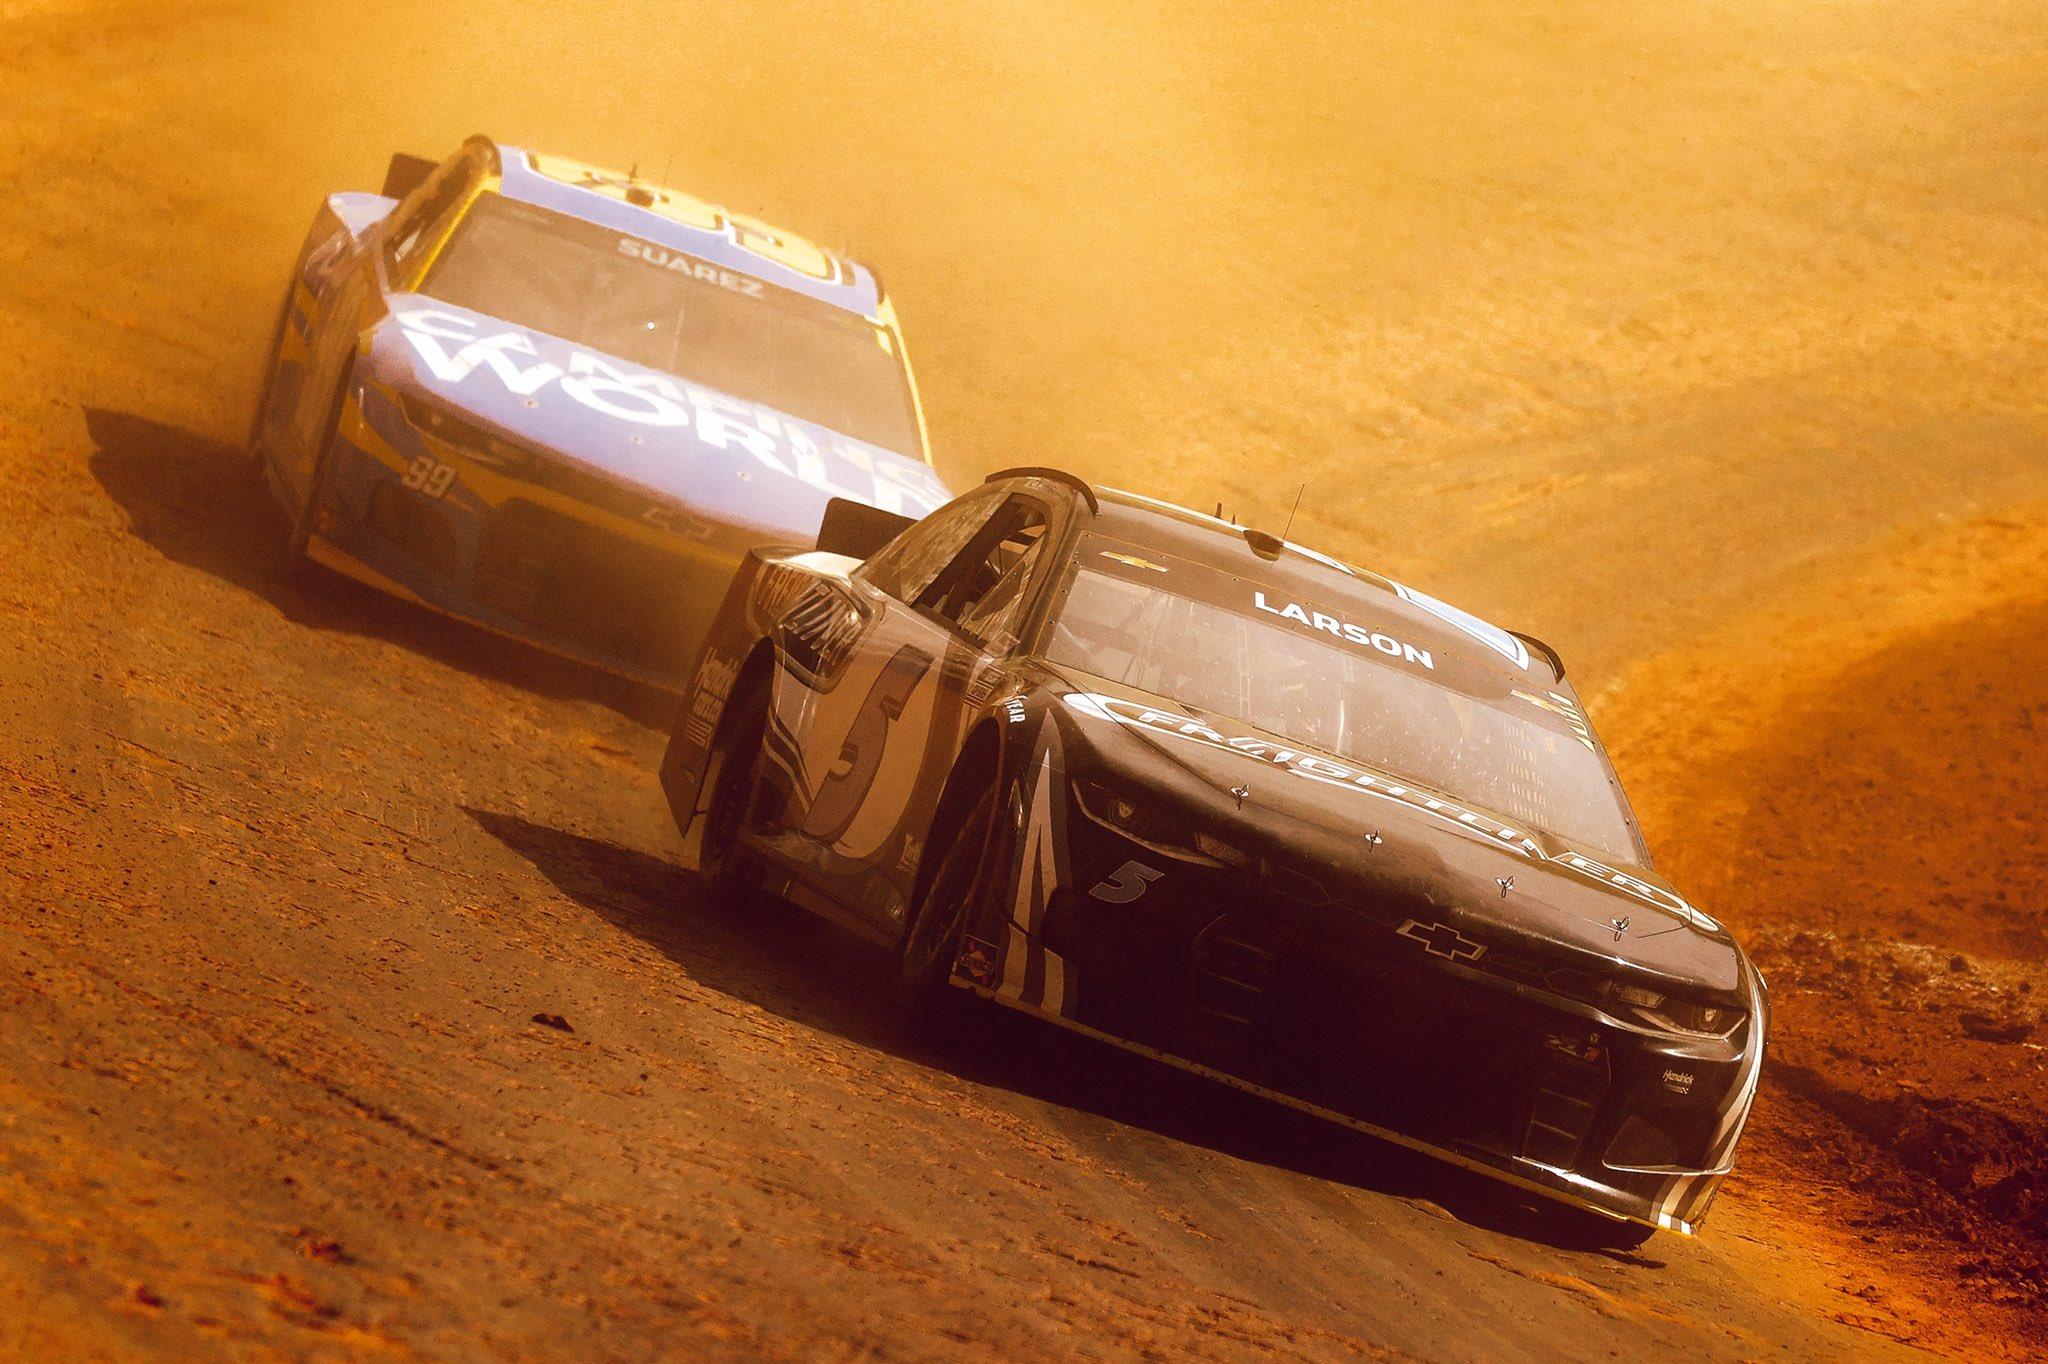 Kyle Larson - Bristol Dirt Track - NASCAR Cup Series